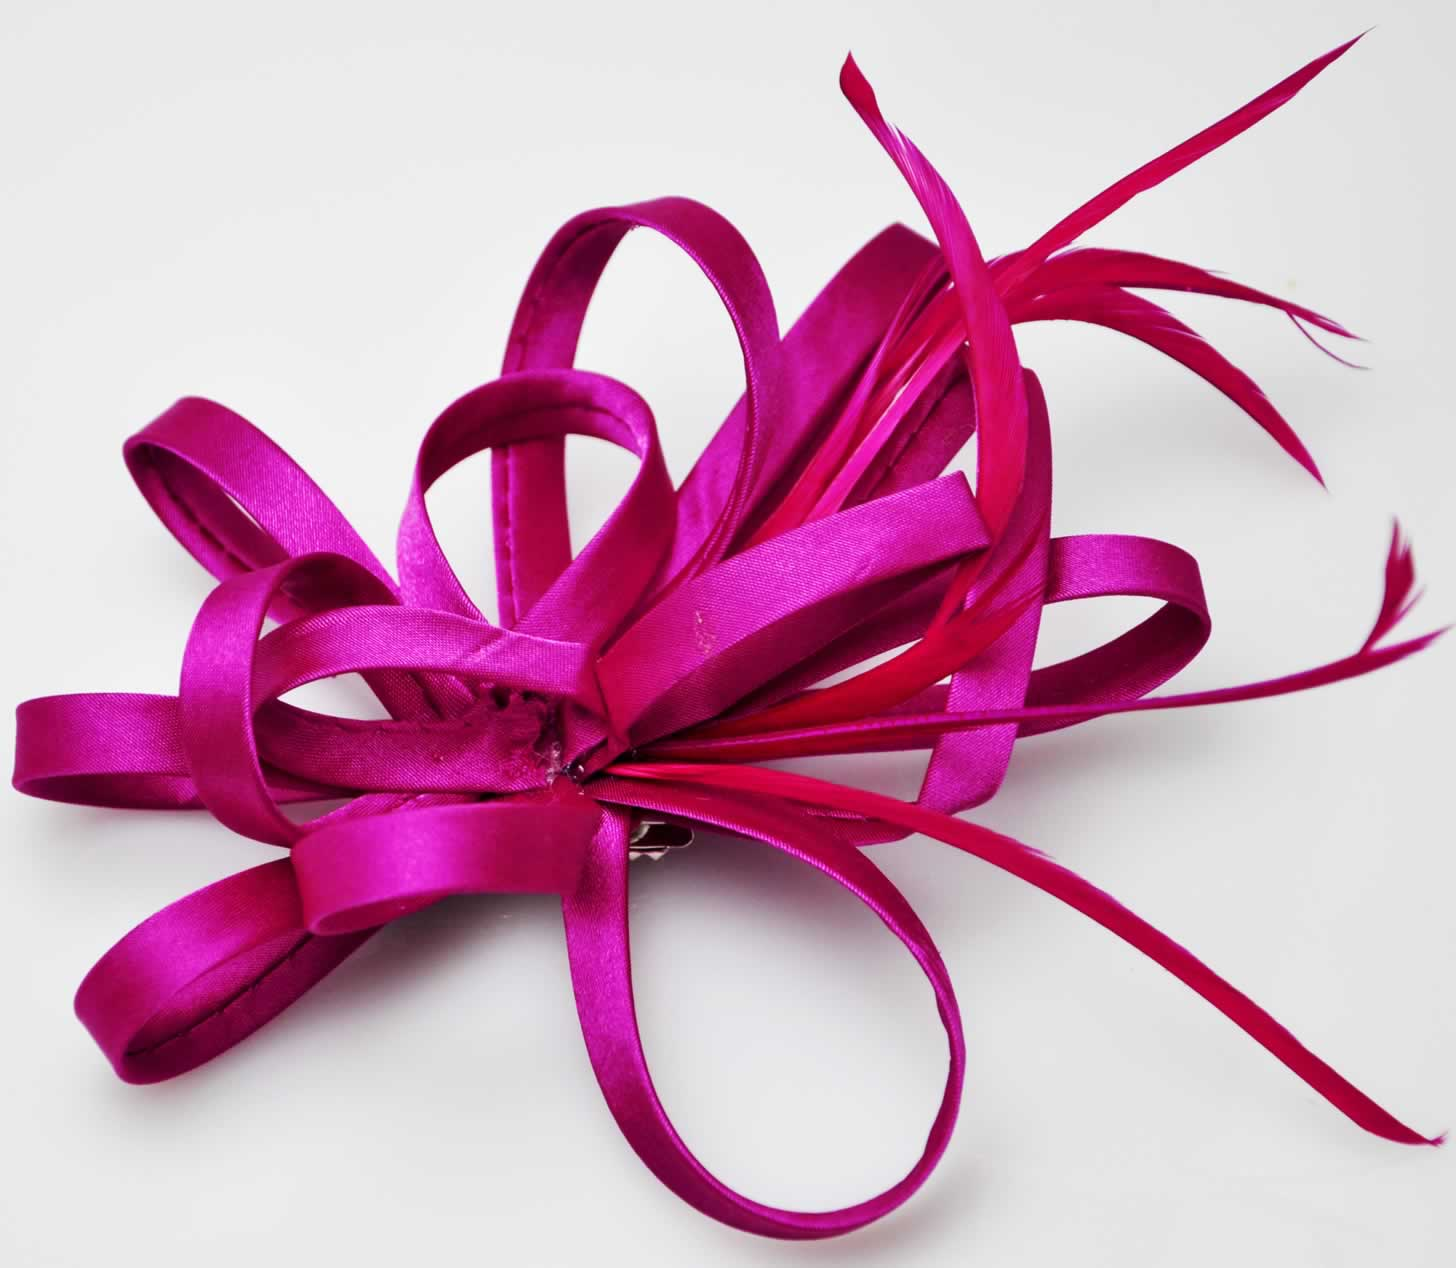 LSH00170 - Fuchsia Feather   Flower Fascinator on Clip 1c8b22f309c